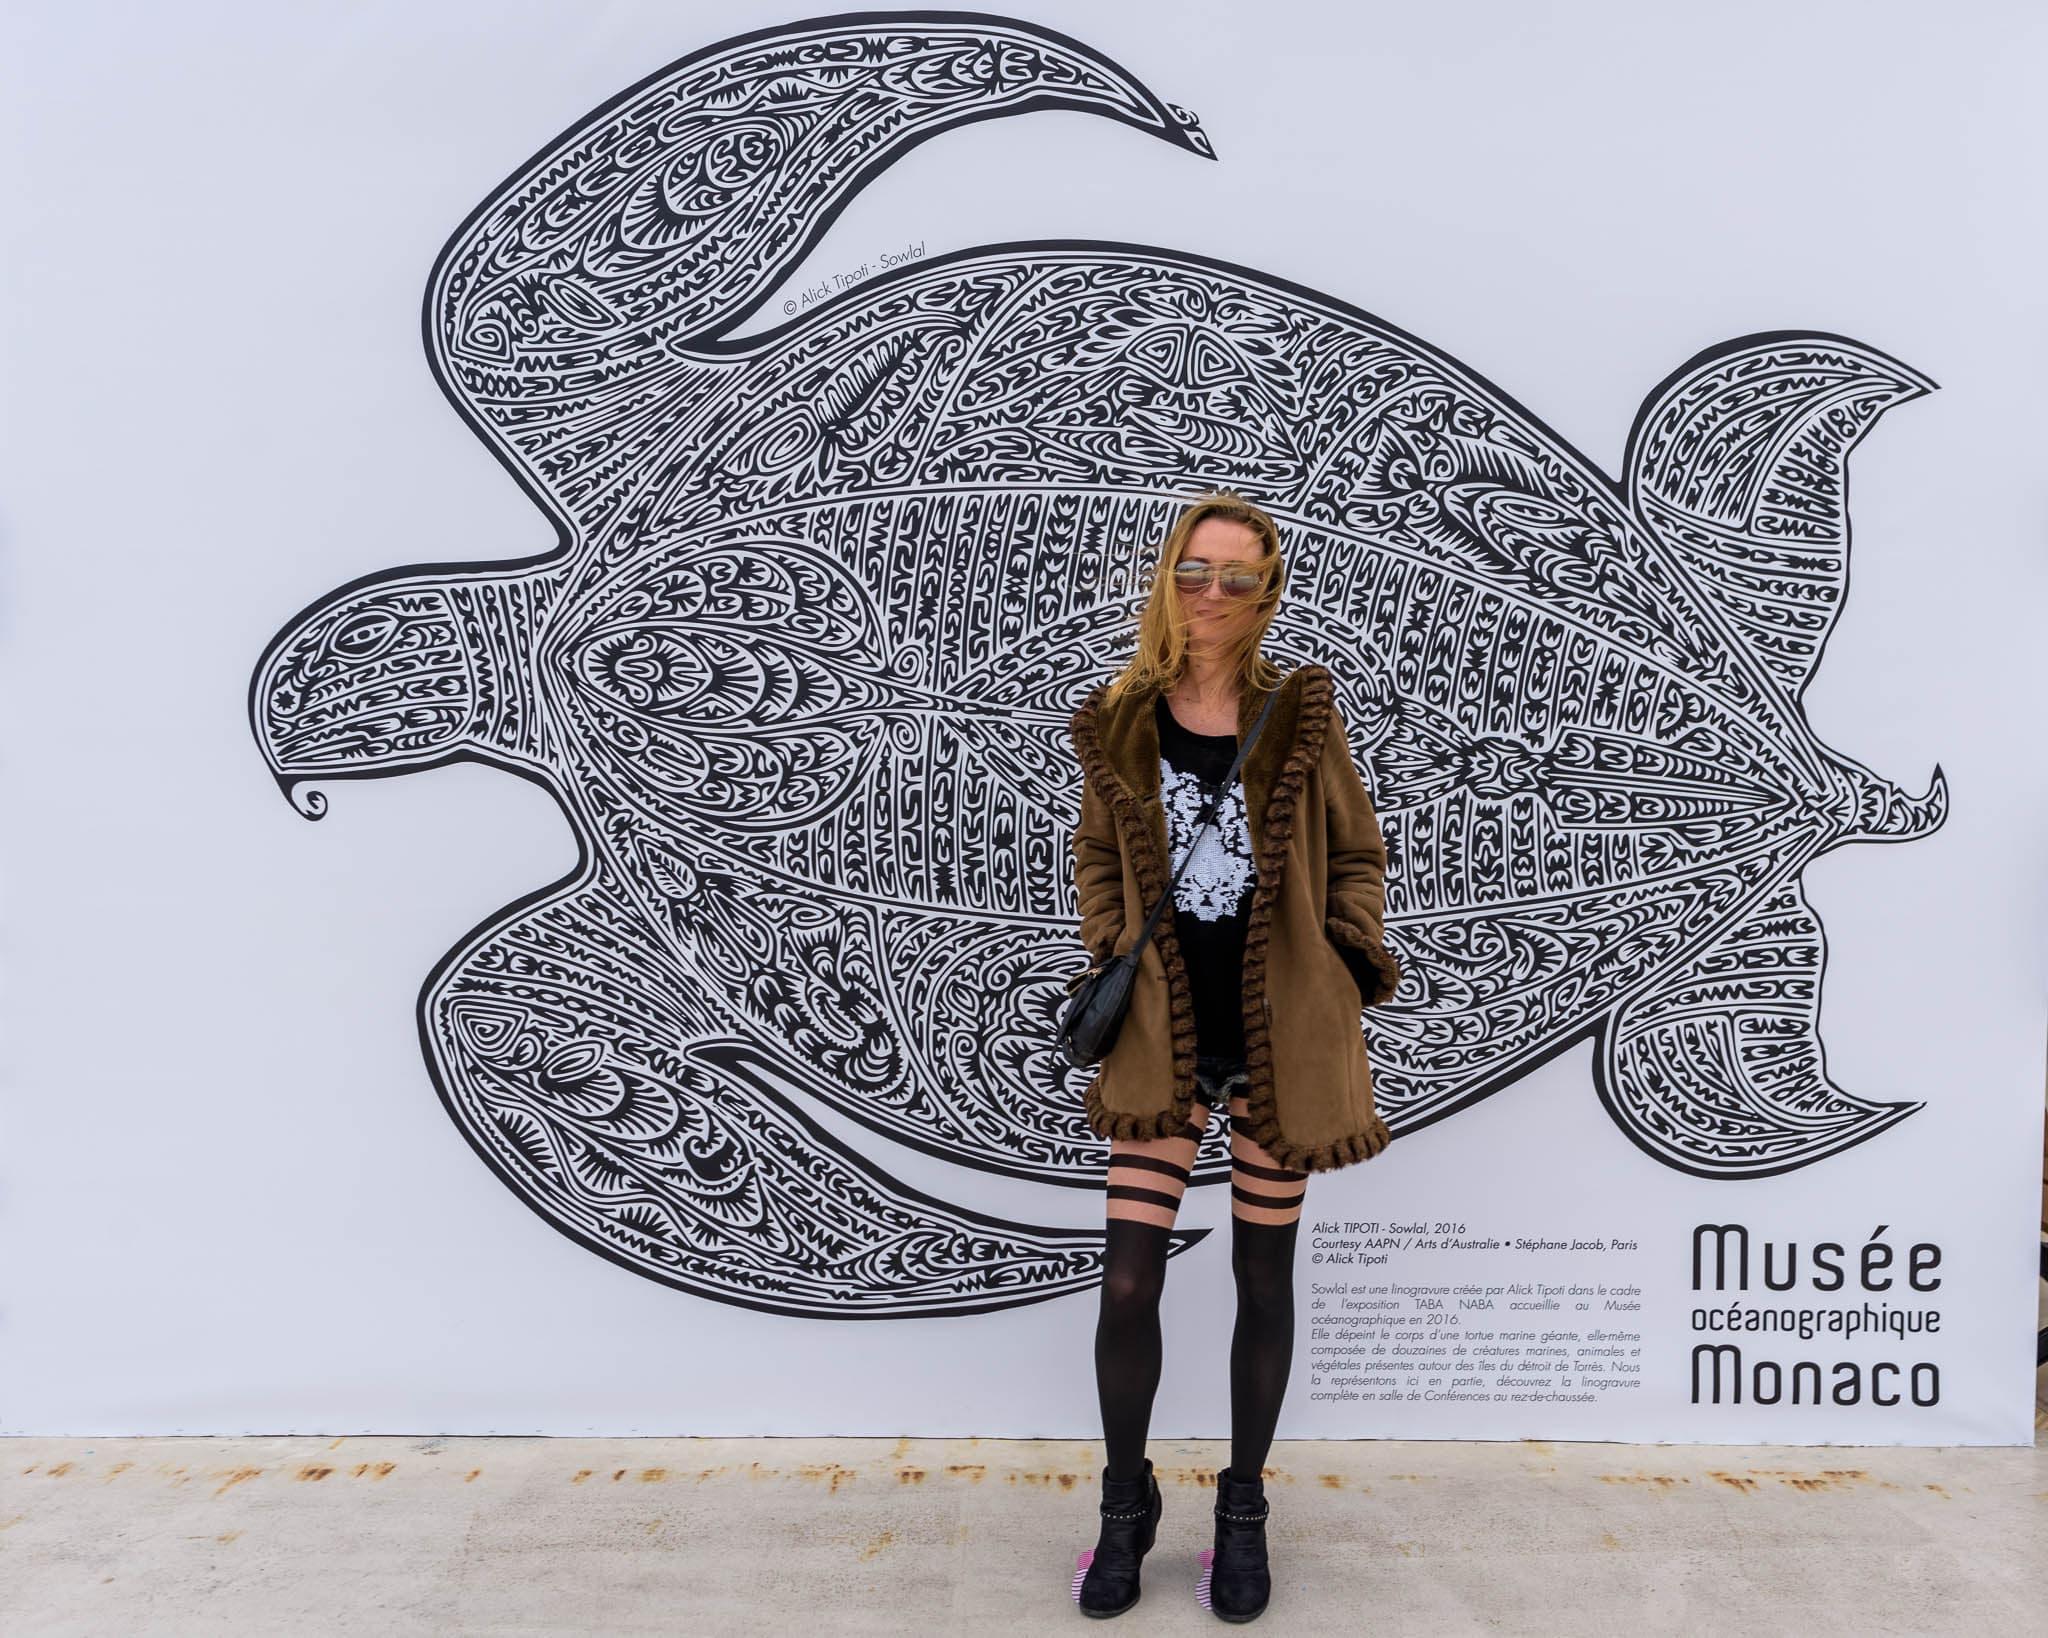 SuzyMae at Musée Océanographique Monaco